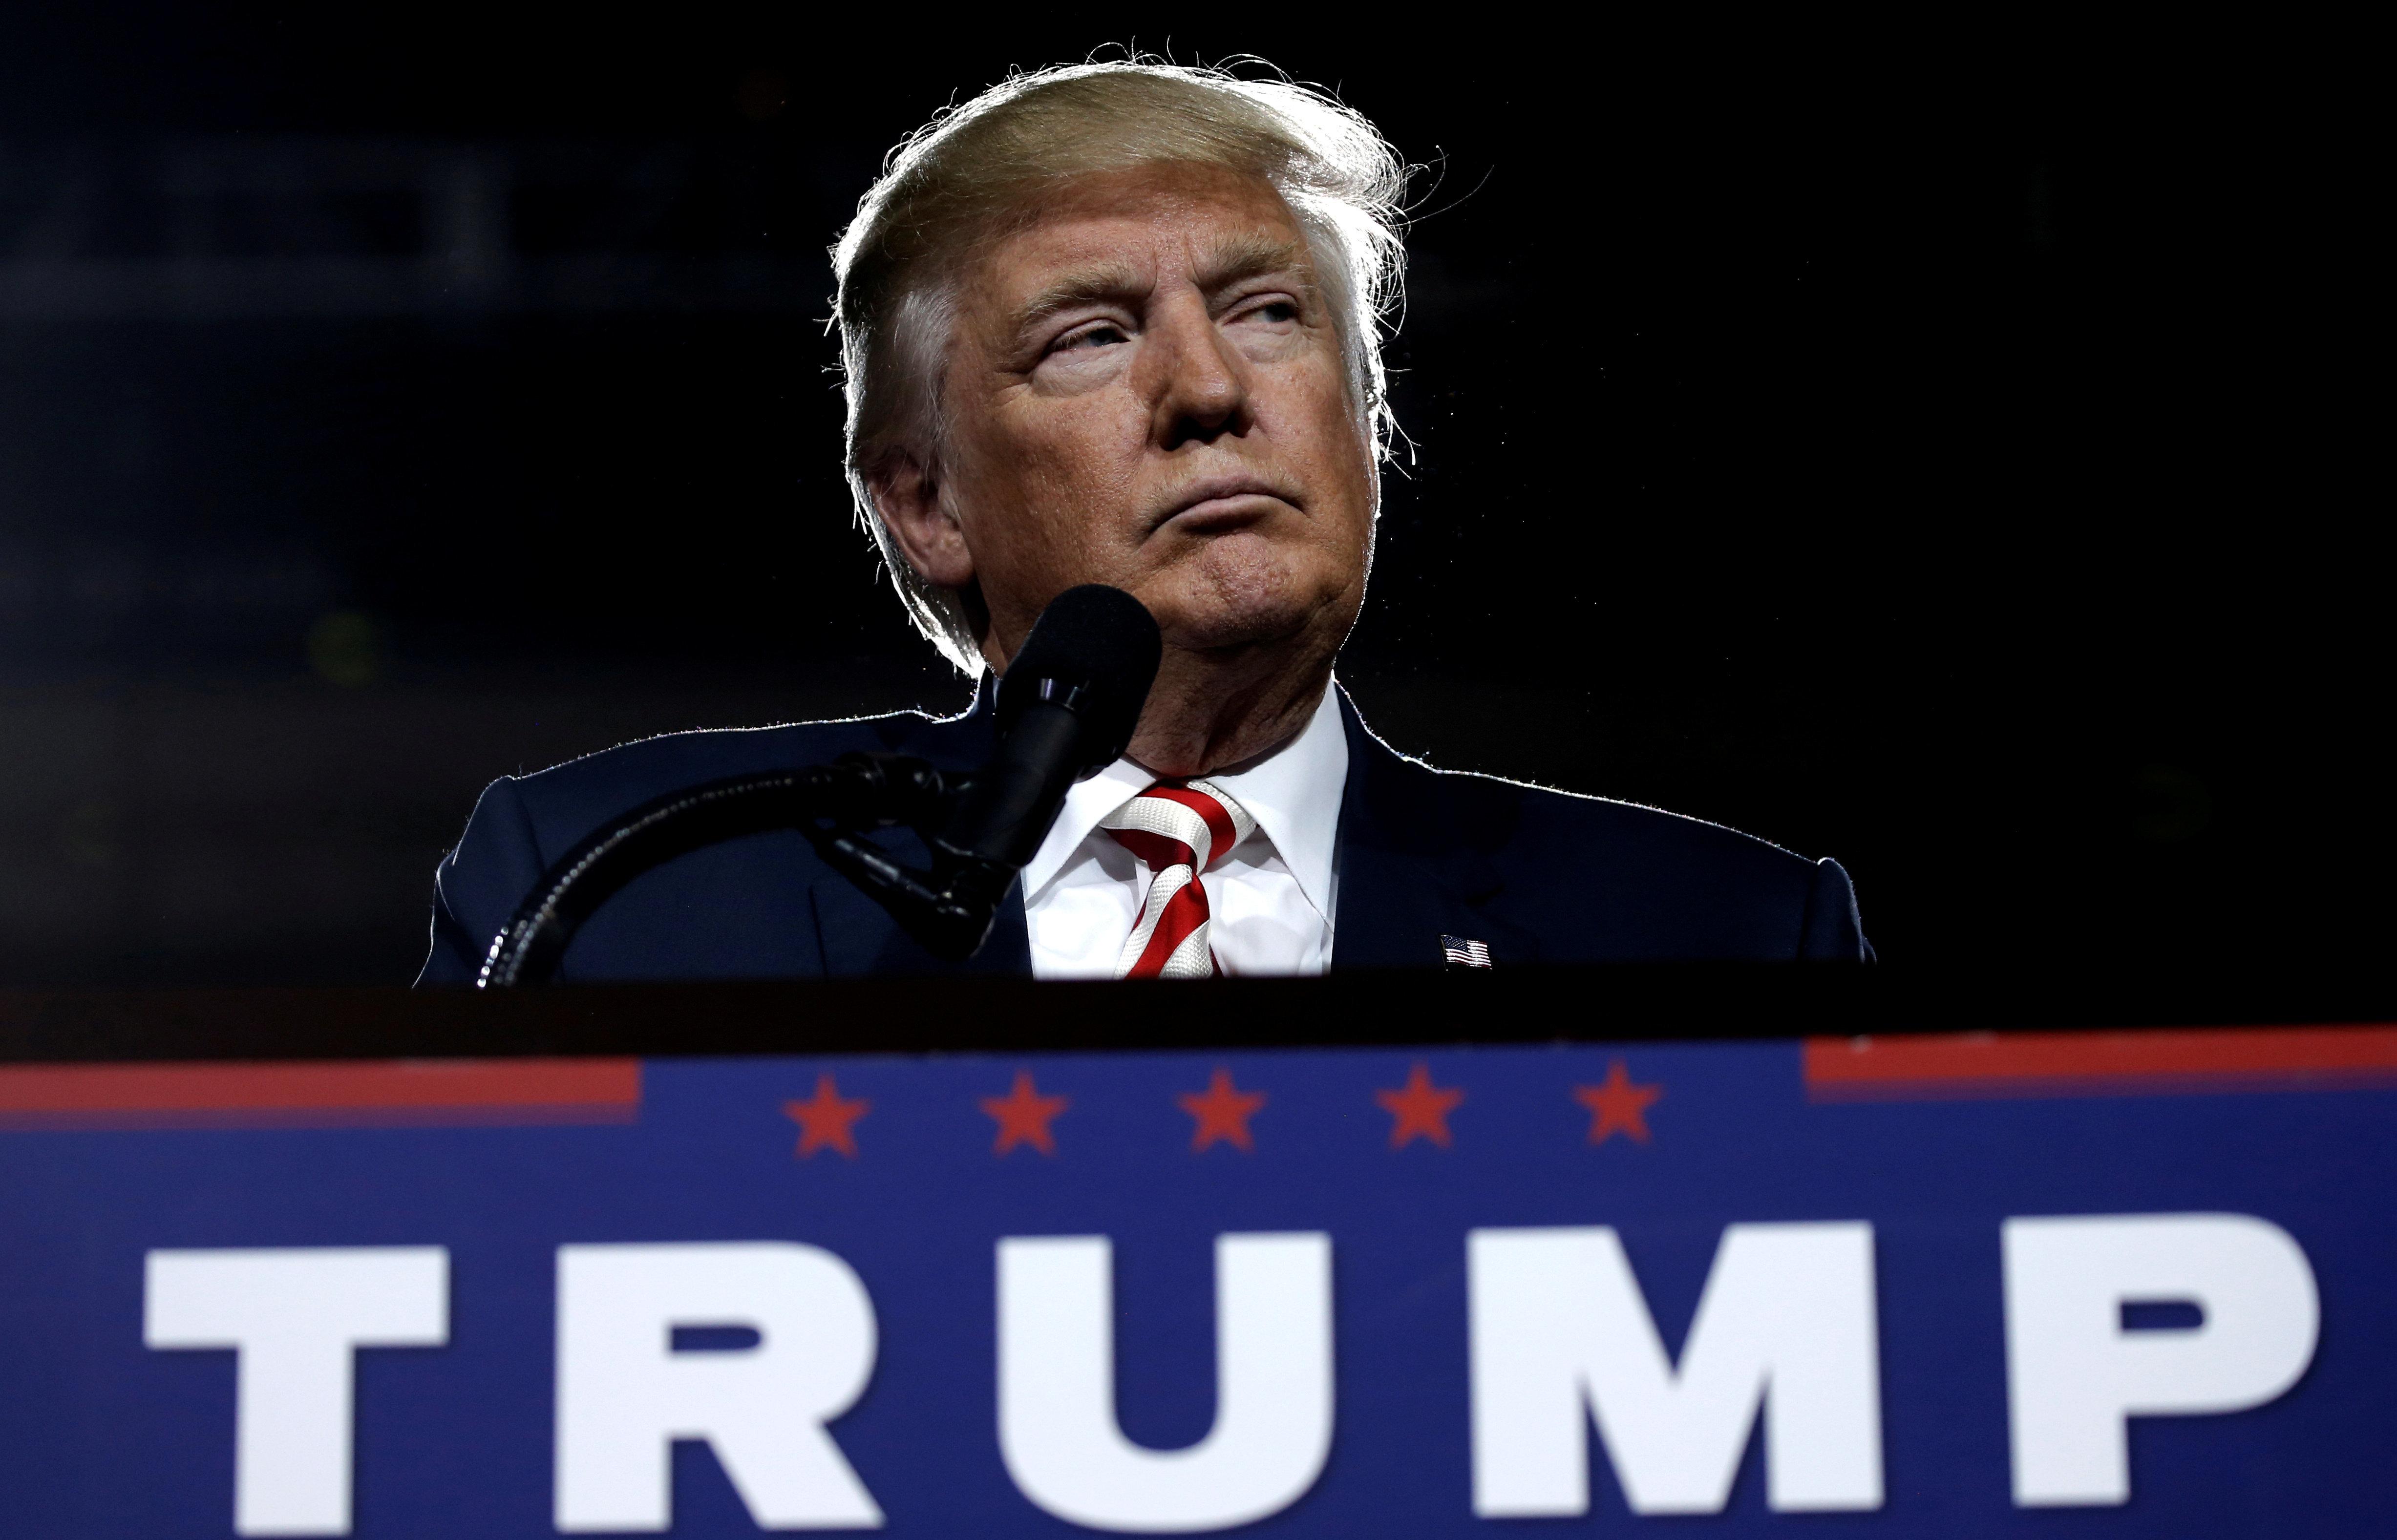 Trump's 'Us vs. Them' Politics Raises Warning Of Global